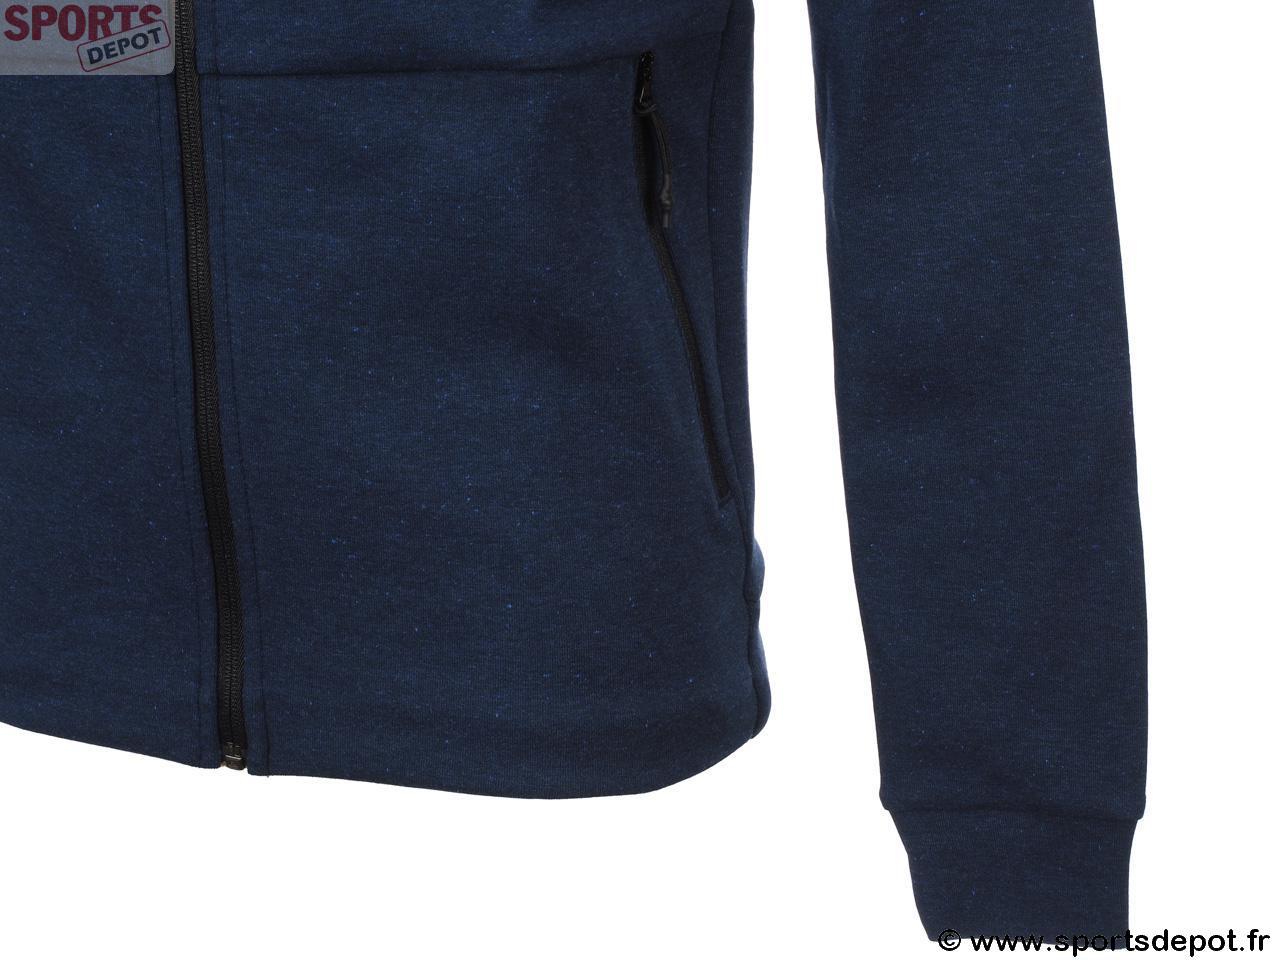 Adidas Id Stadium FZ b45728 T Shirt pour Homme: